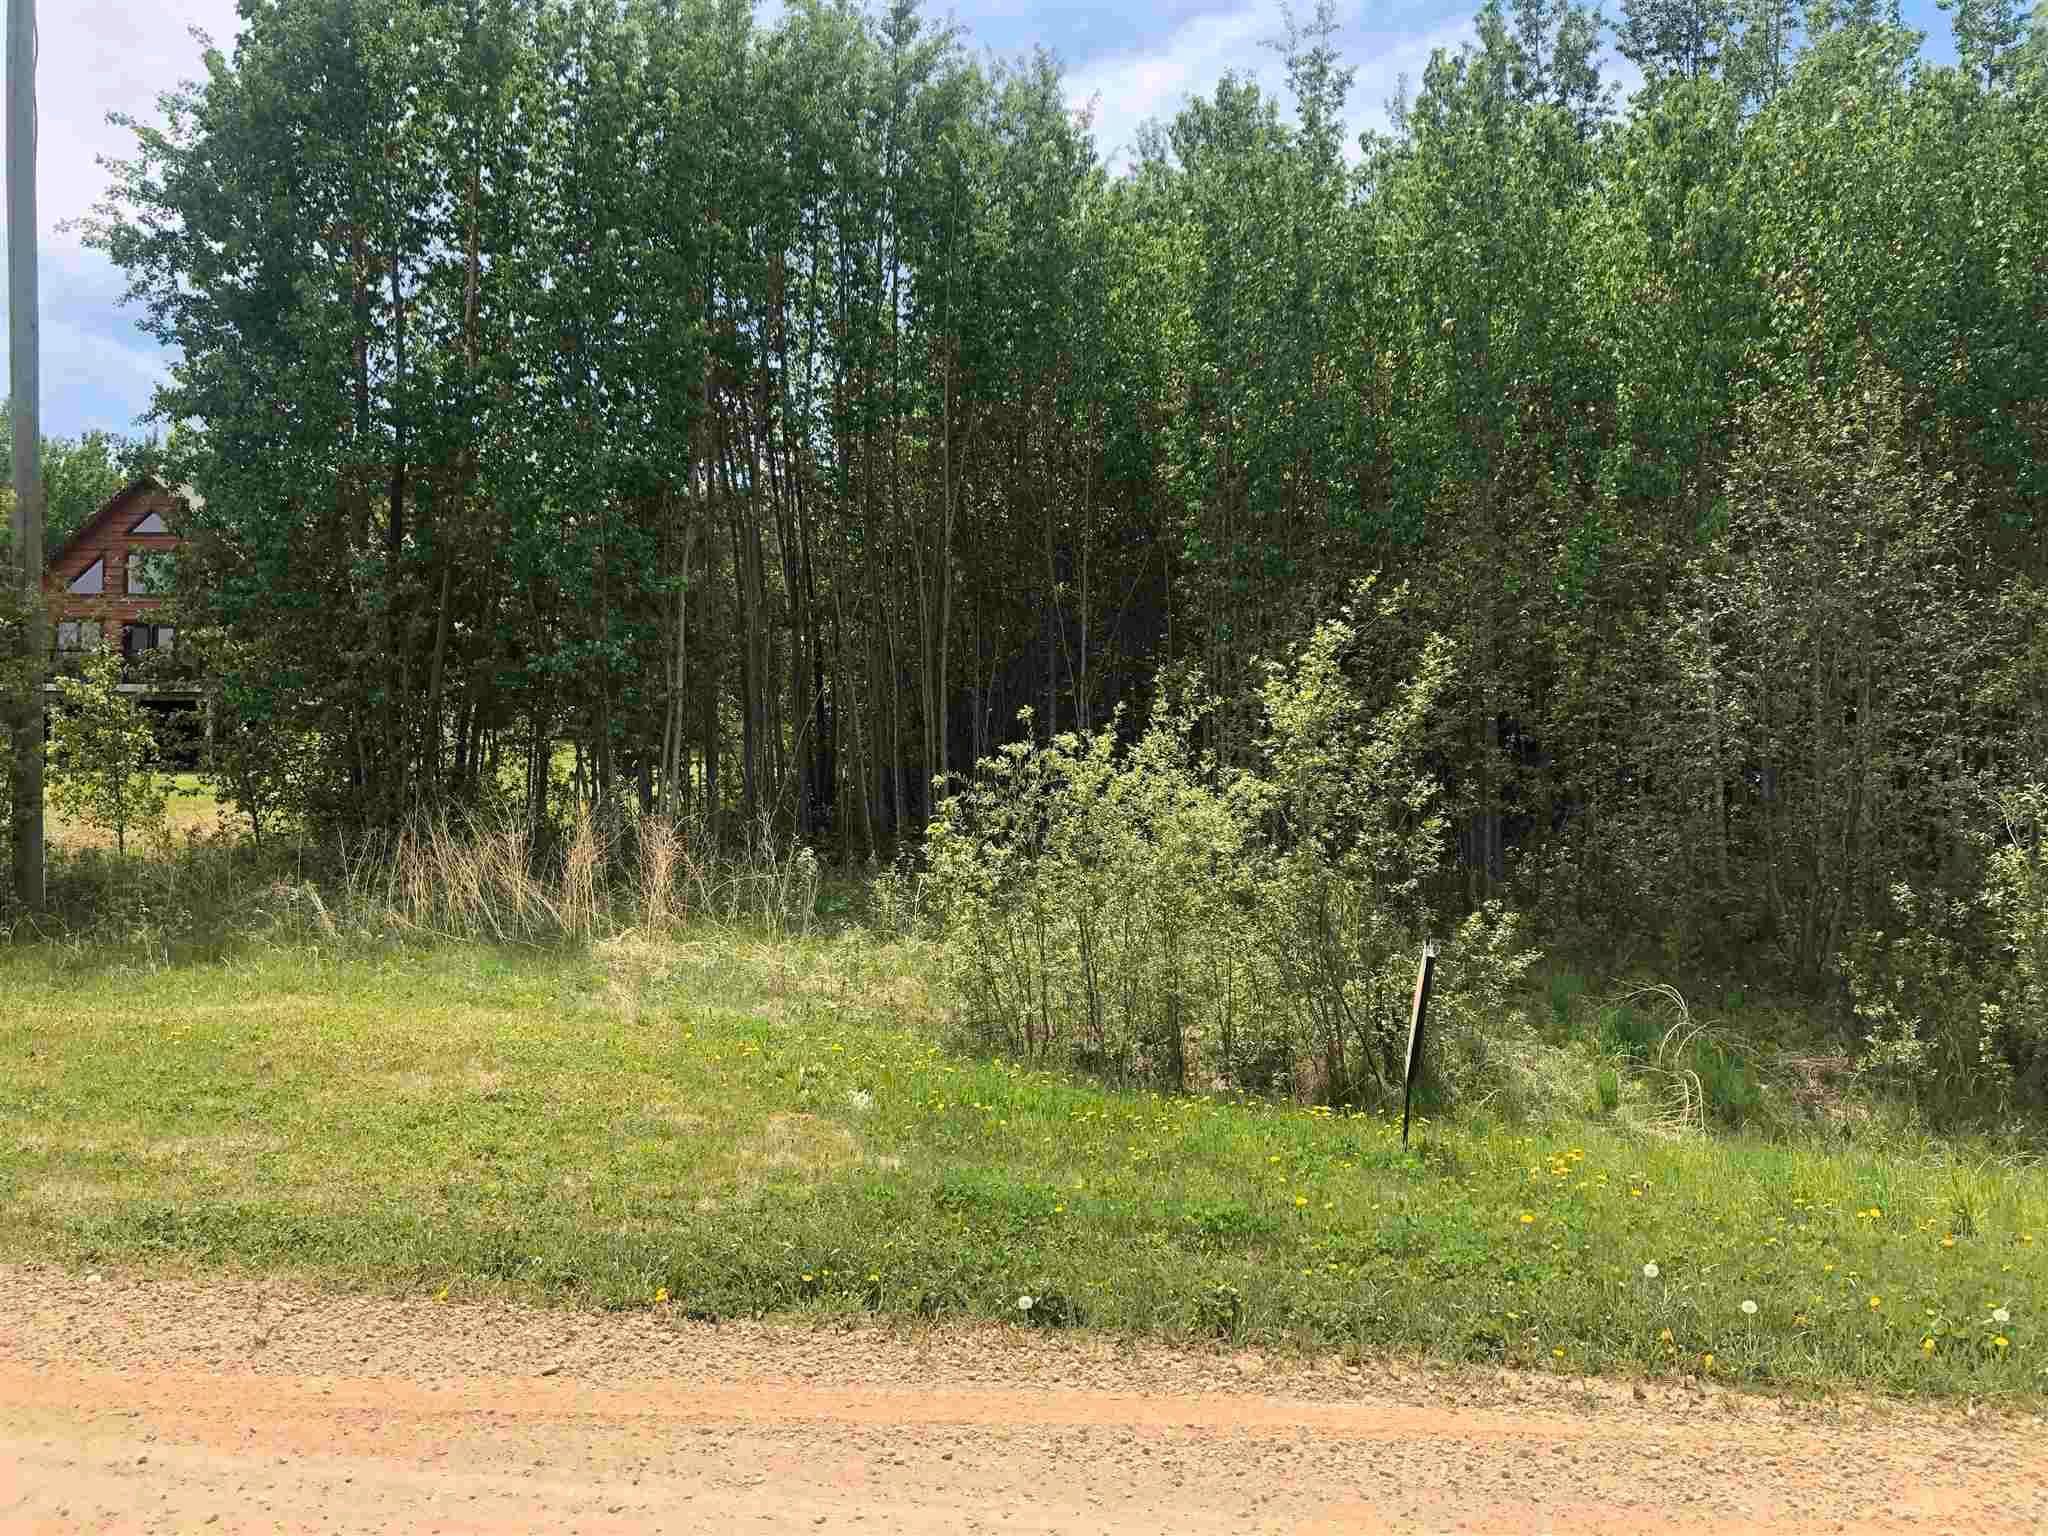 Main Photo: 11 Crystal Keys: Rural Wetaskiwin County Rural Land/Vacant Lot for sale : MLS®# E4247527